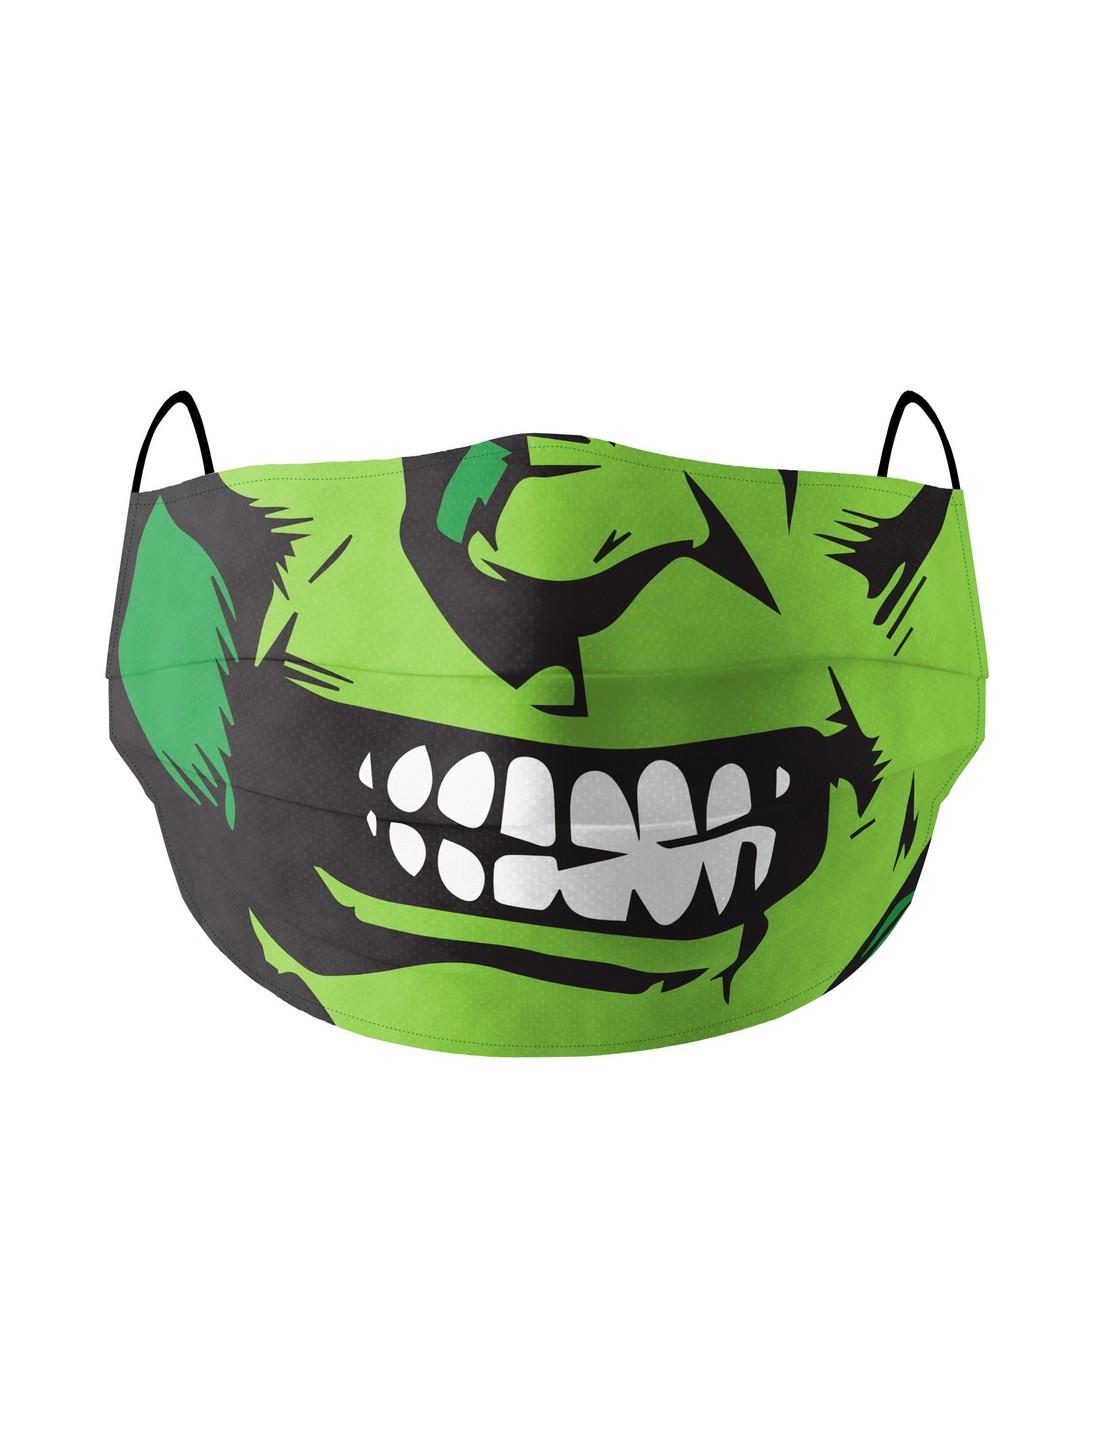 Soxytoes | Soxytoes Green Stylish Protective Washable Mouth Cover Face Mask